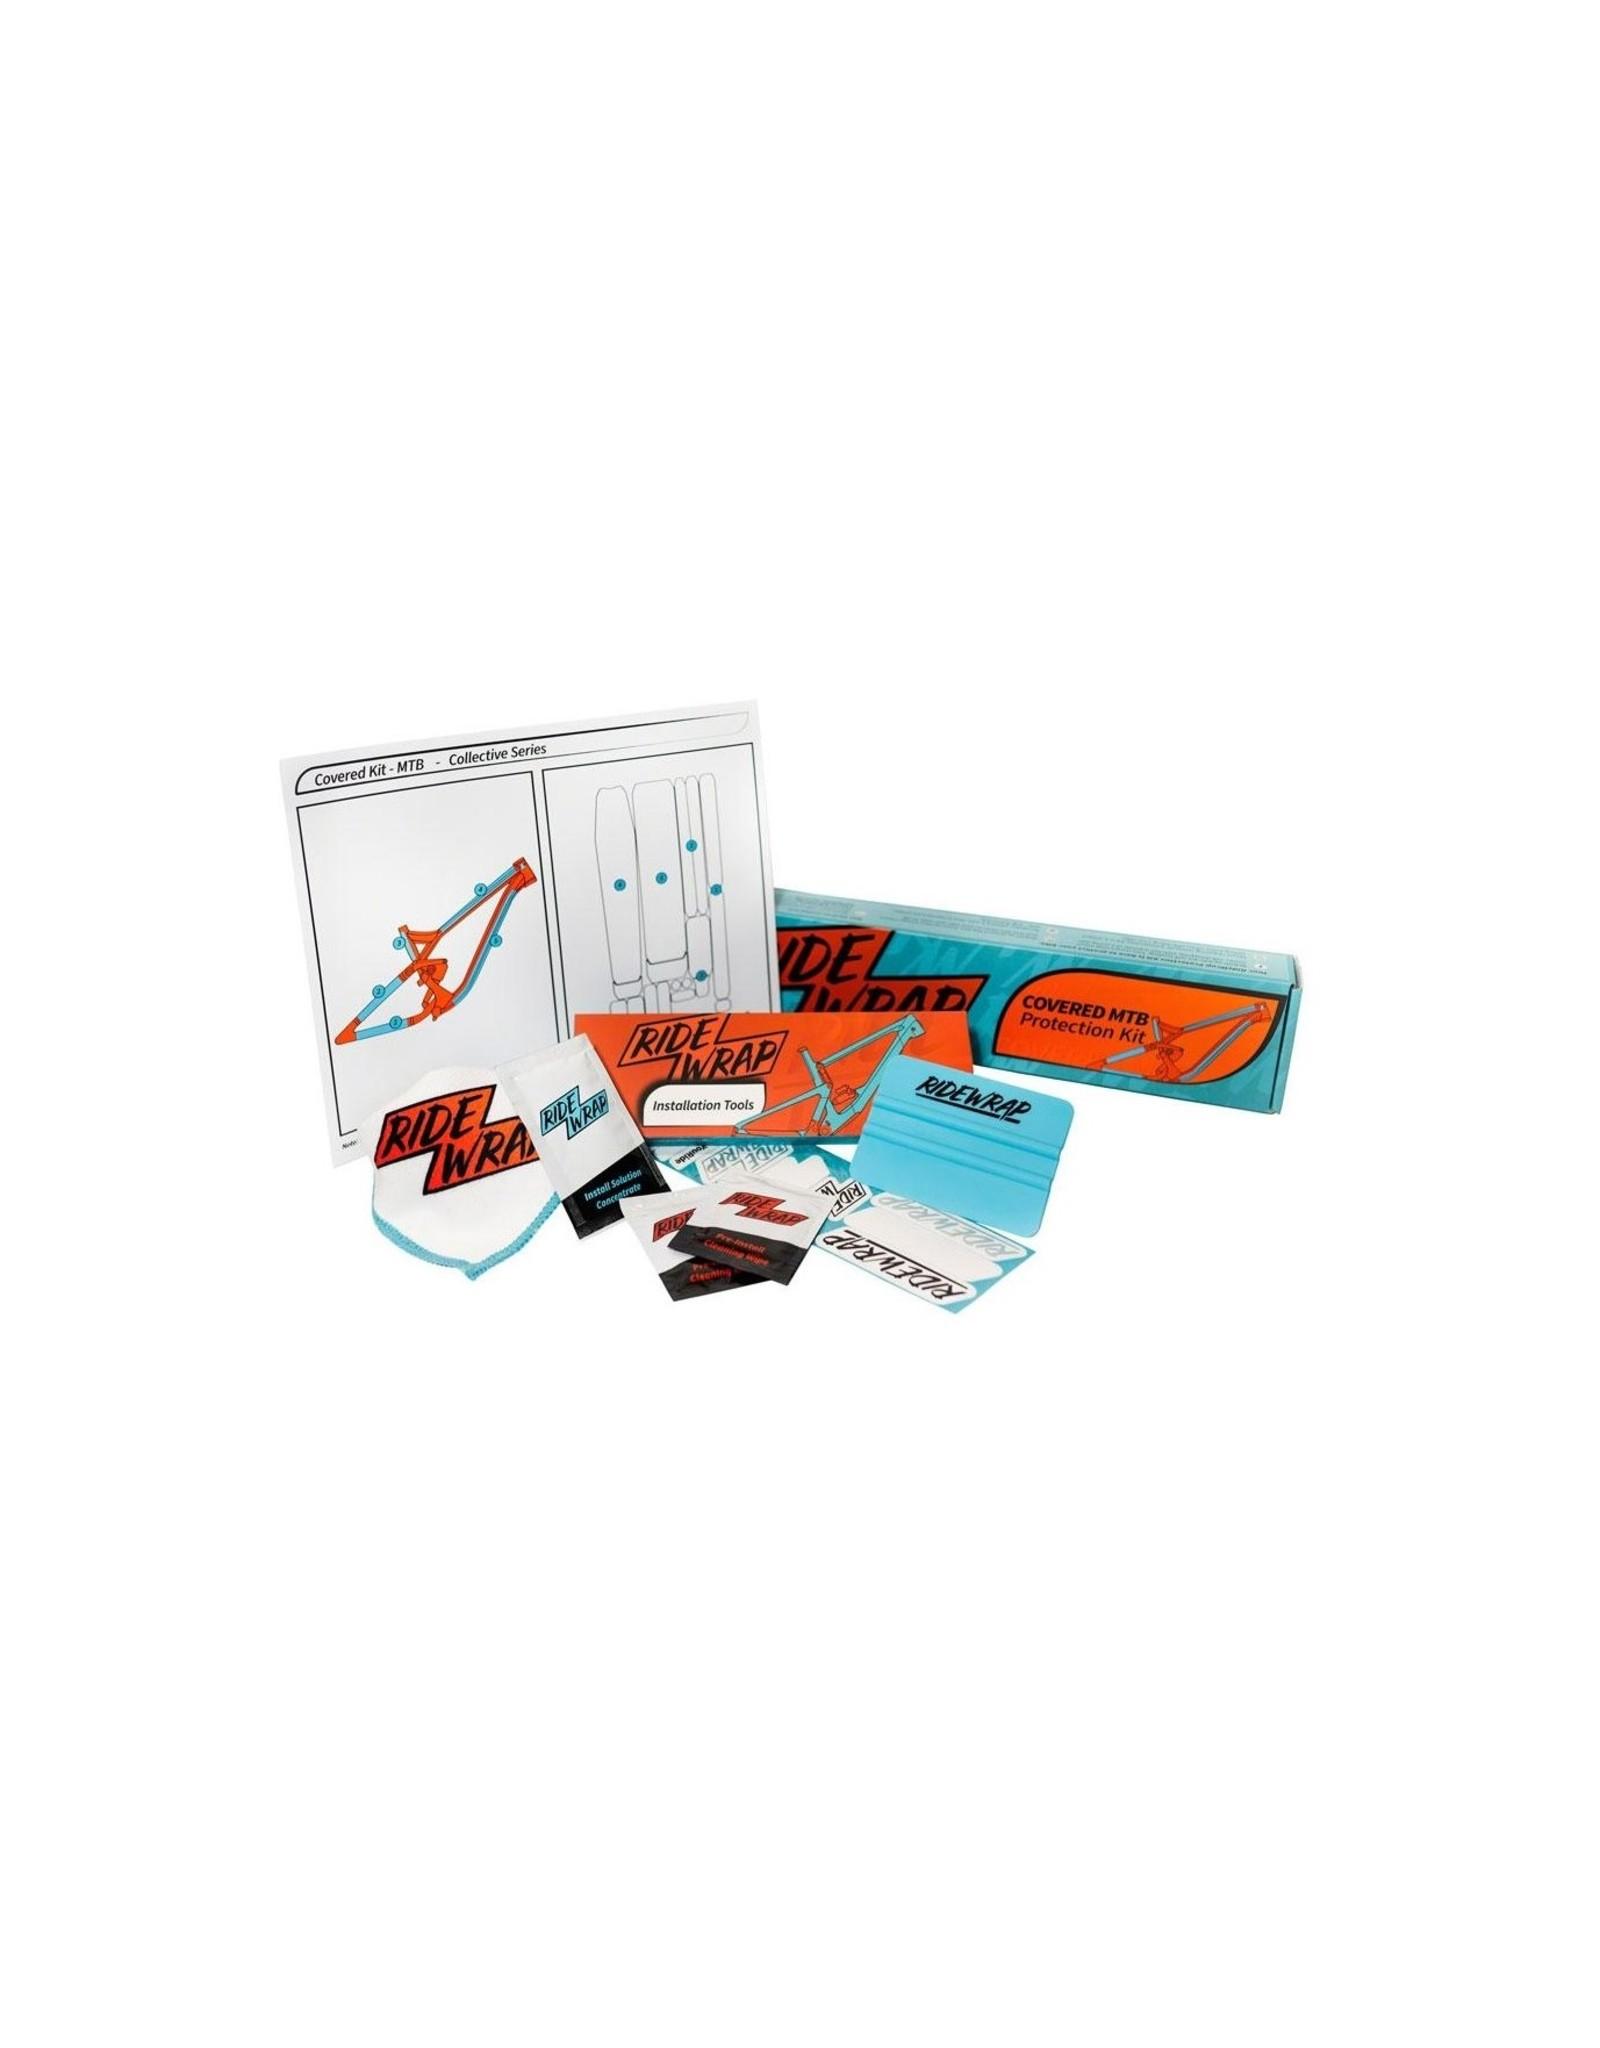 RideWrap RideWrap Covered Dual Suspension MTB Frame Protection Kit - Matte